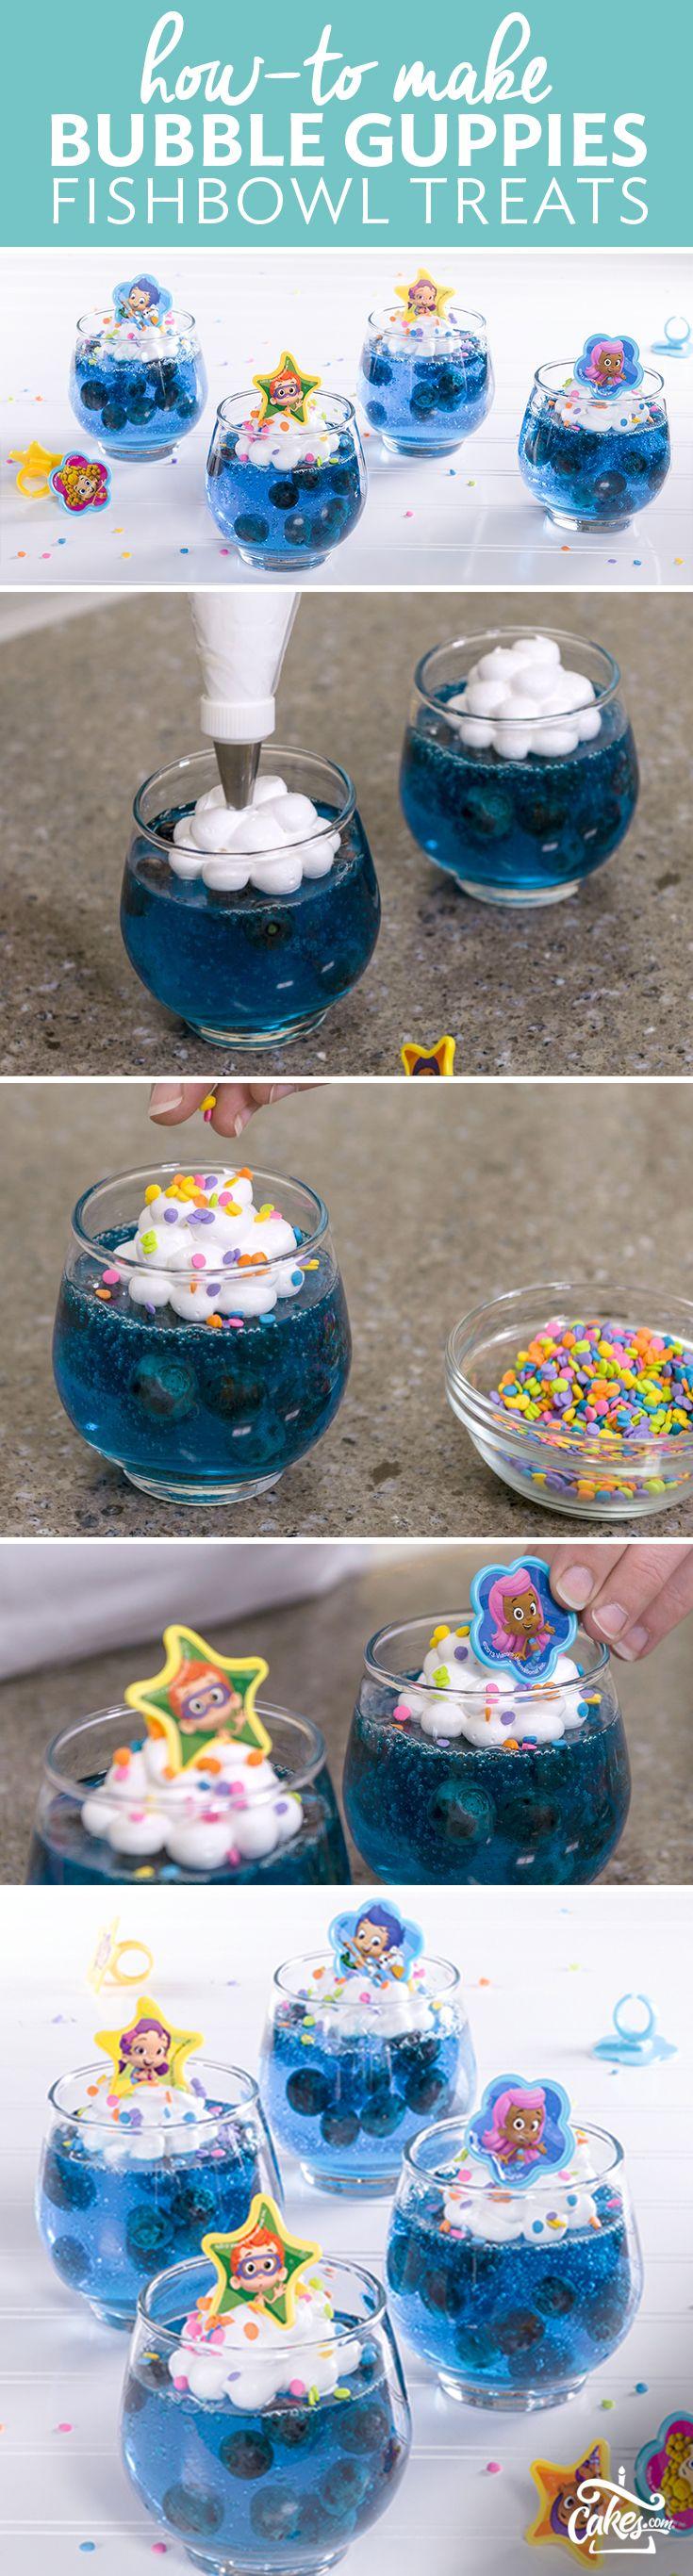 Easy Birthday Idea For Bubble Guppies